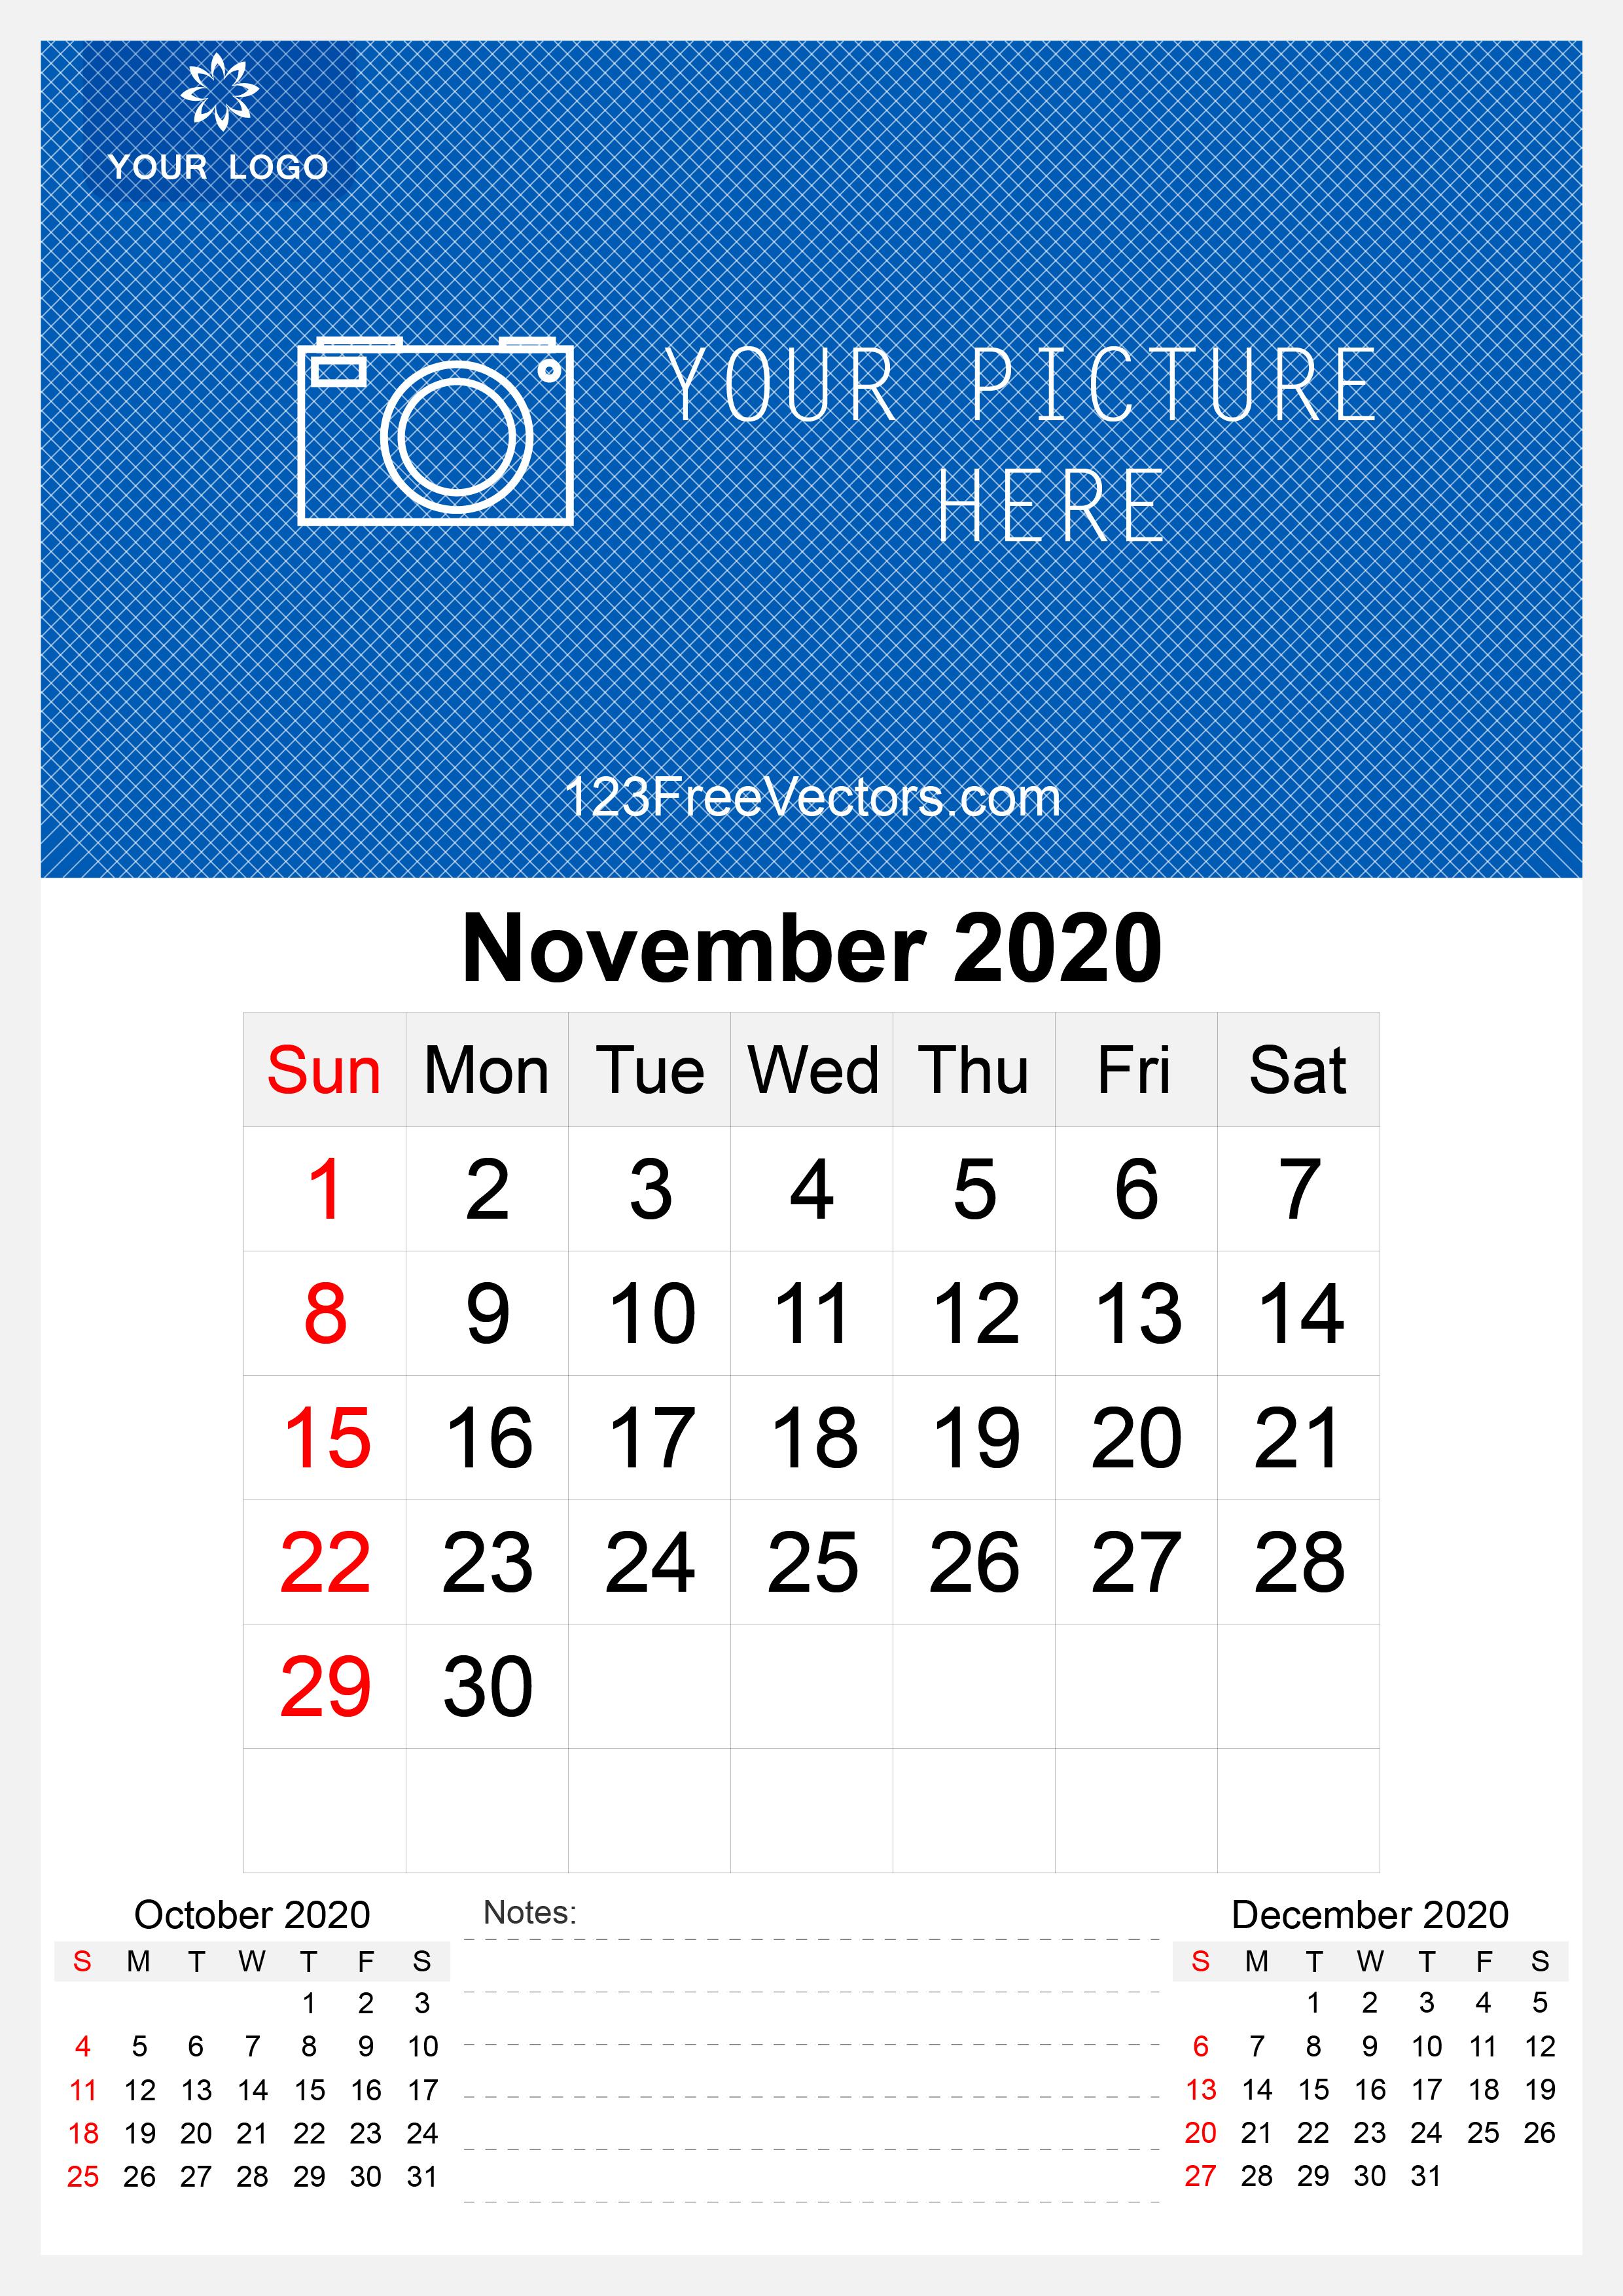 2020 November Wall Calendar Template Free